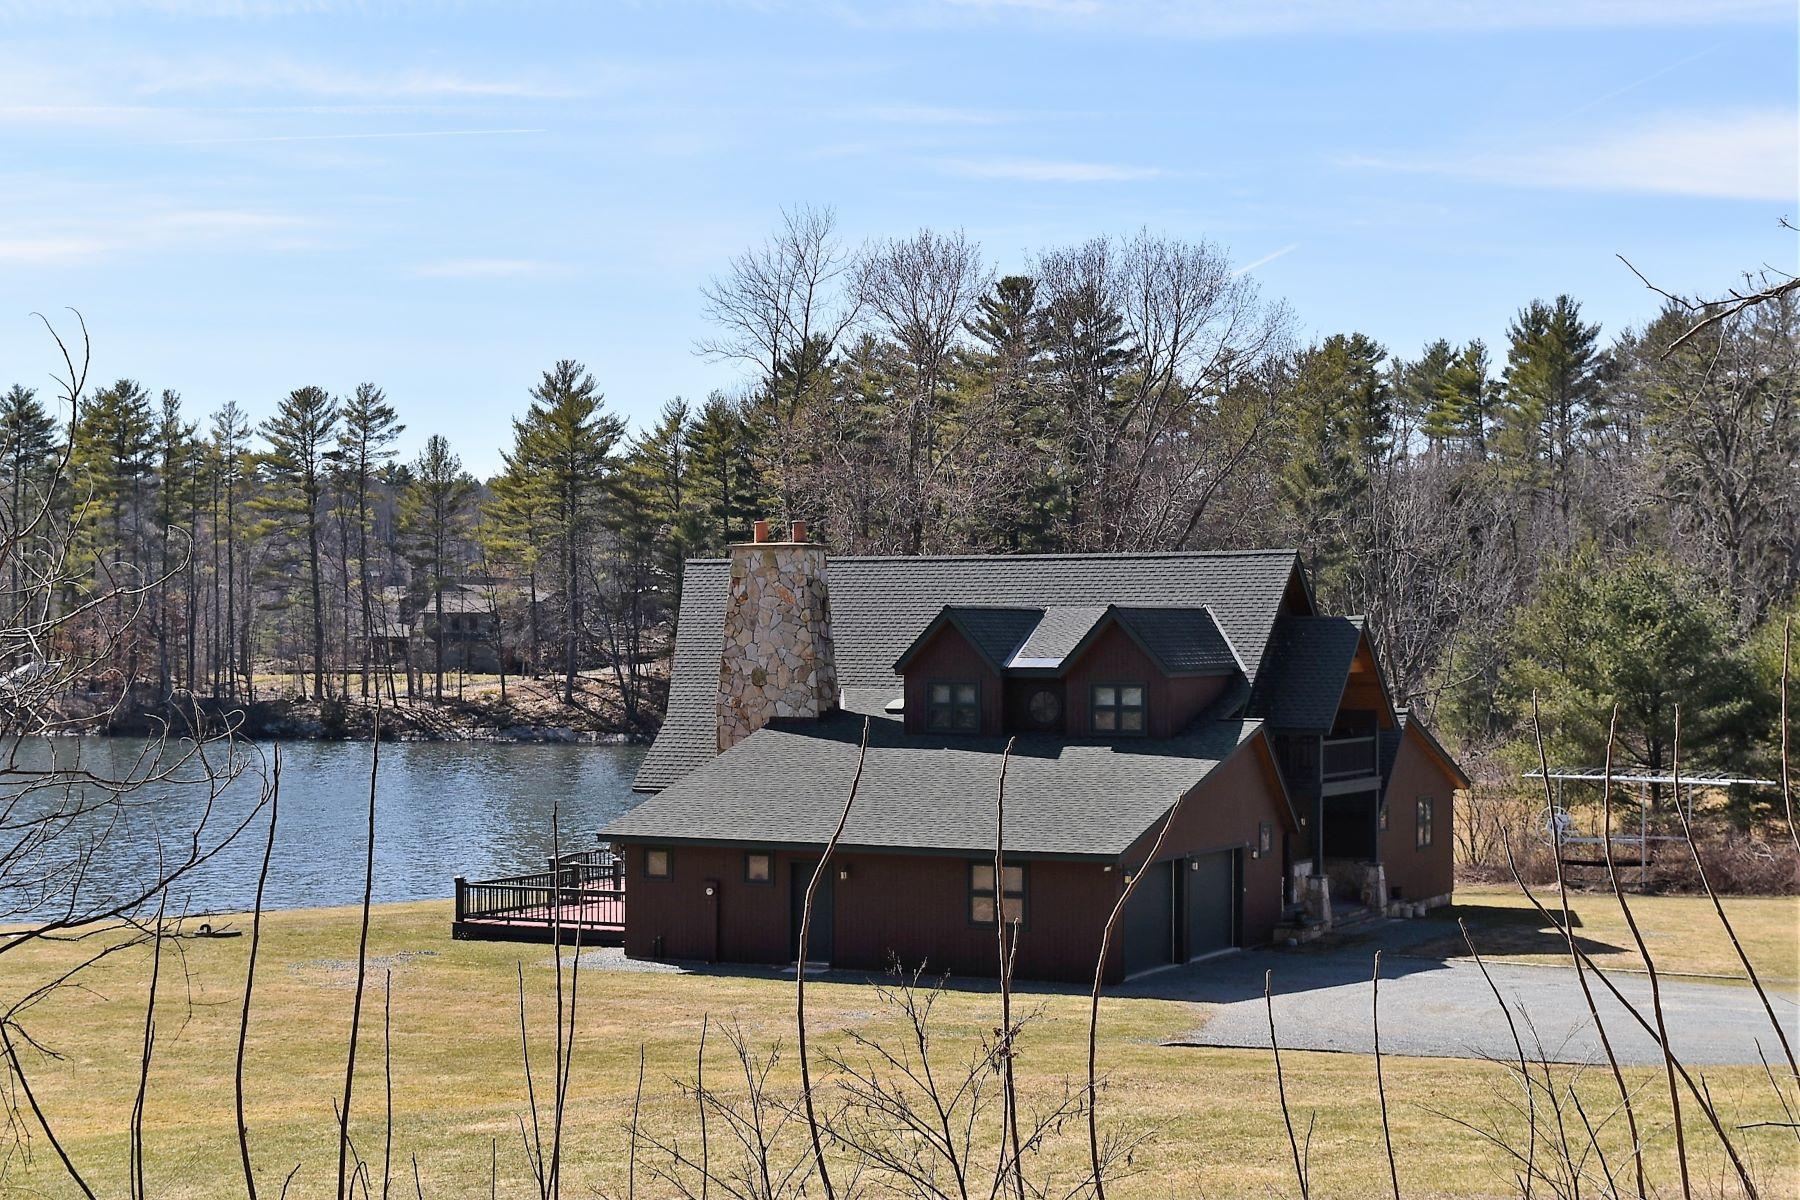 Casa para uma família para Venda às Lake Bomoseen Prestine, 155 FT. Frontage, 1.8 Acre 4539 Route 30 N Castleton, Vermont, 05732 Estados Unidos